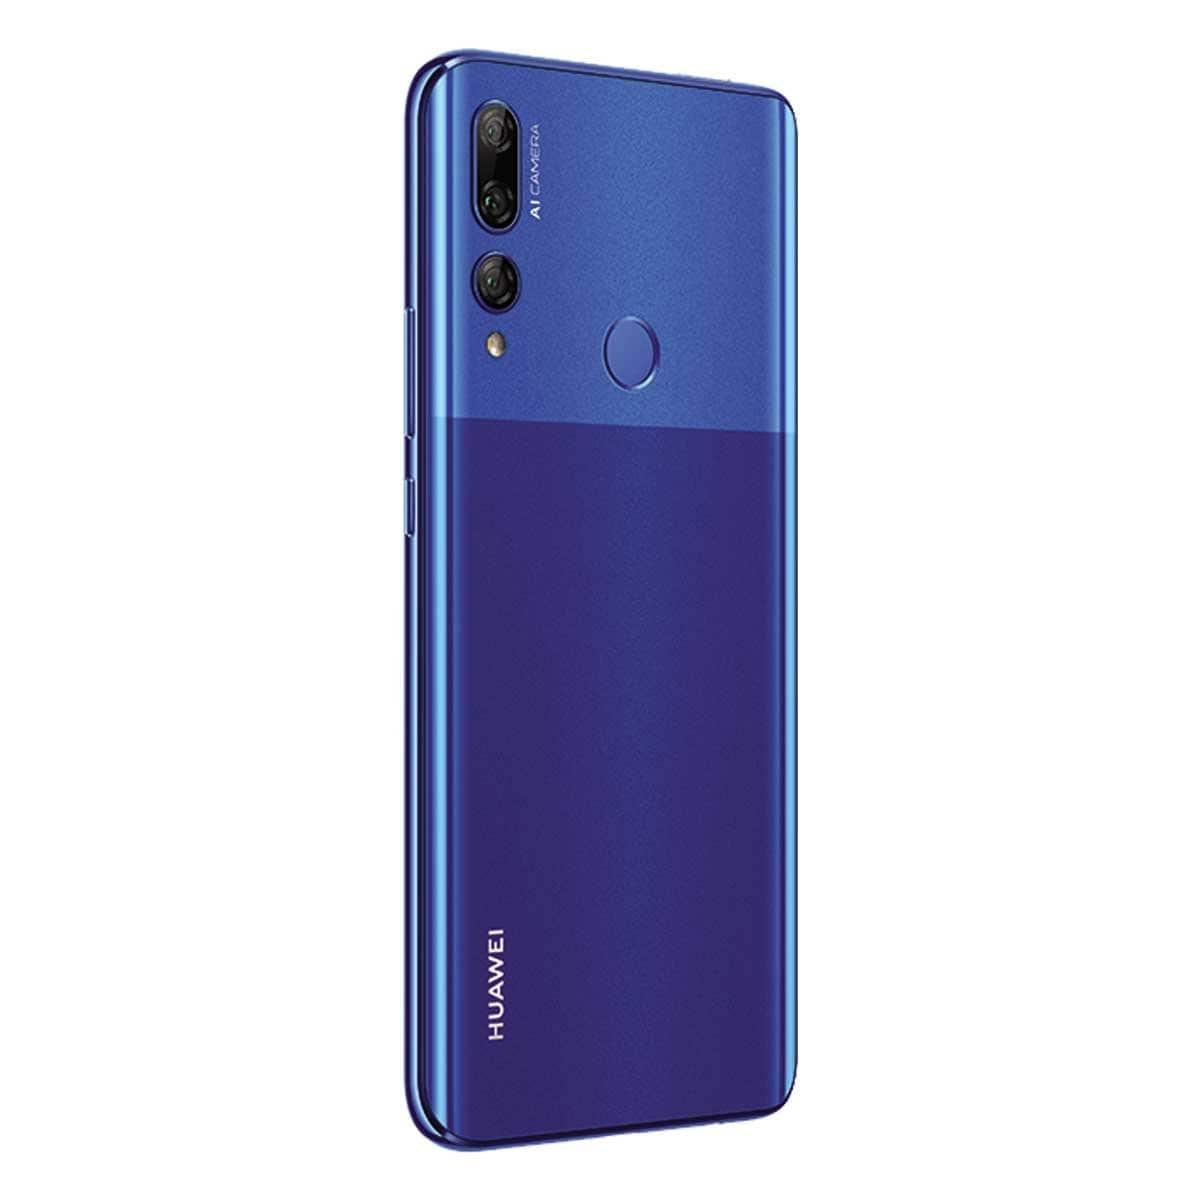 Celular Huawei Y9 Prime 2019 Color Azul R9 (Telcel)